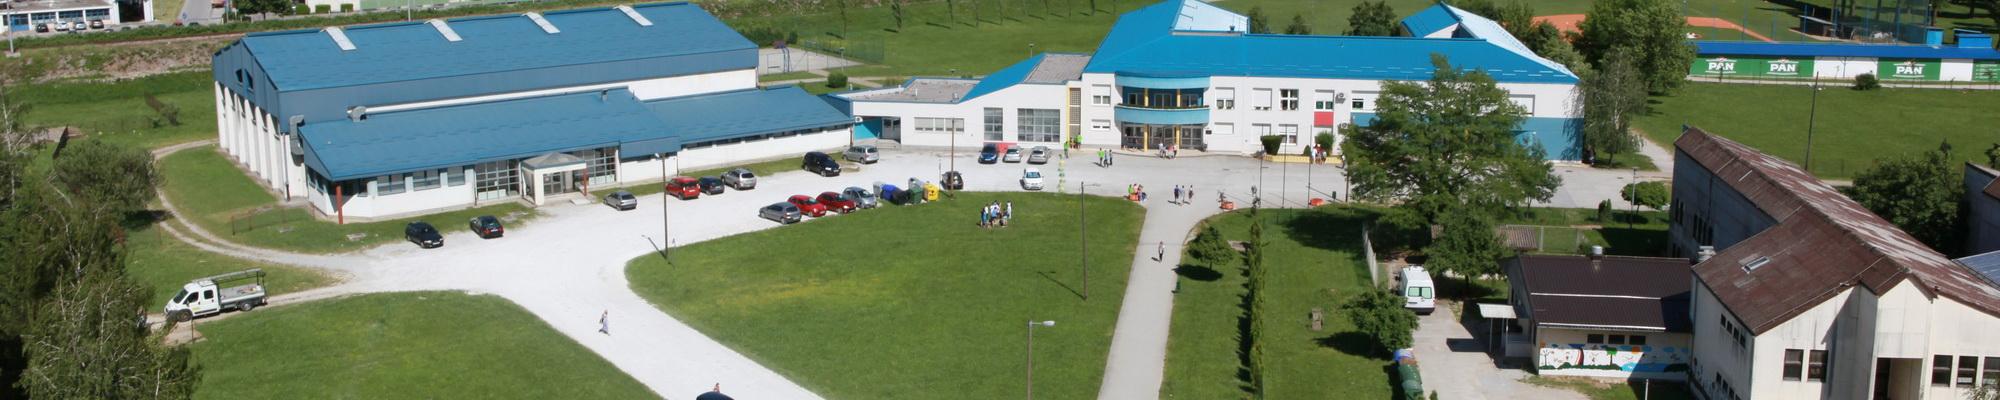 Osnovna škola Grabrik